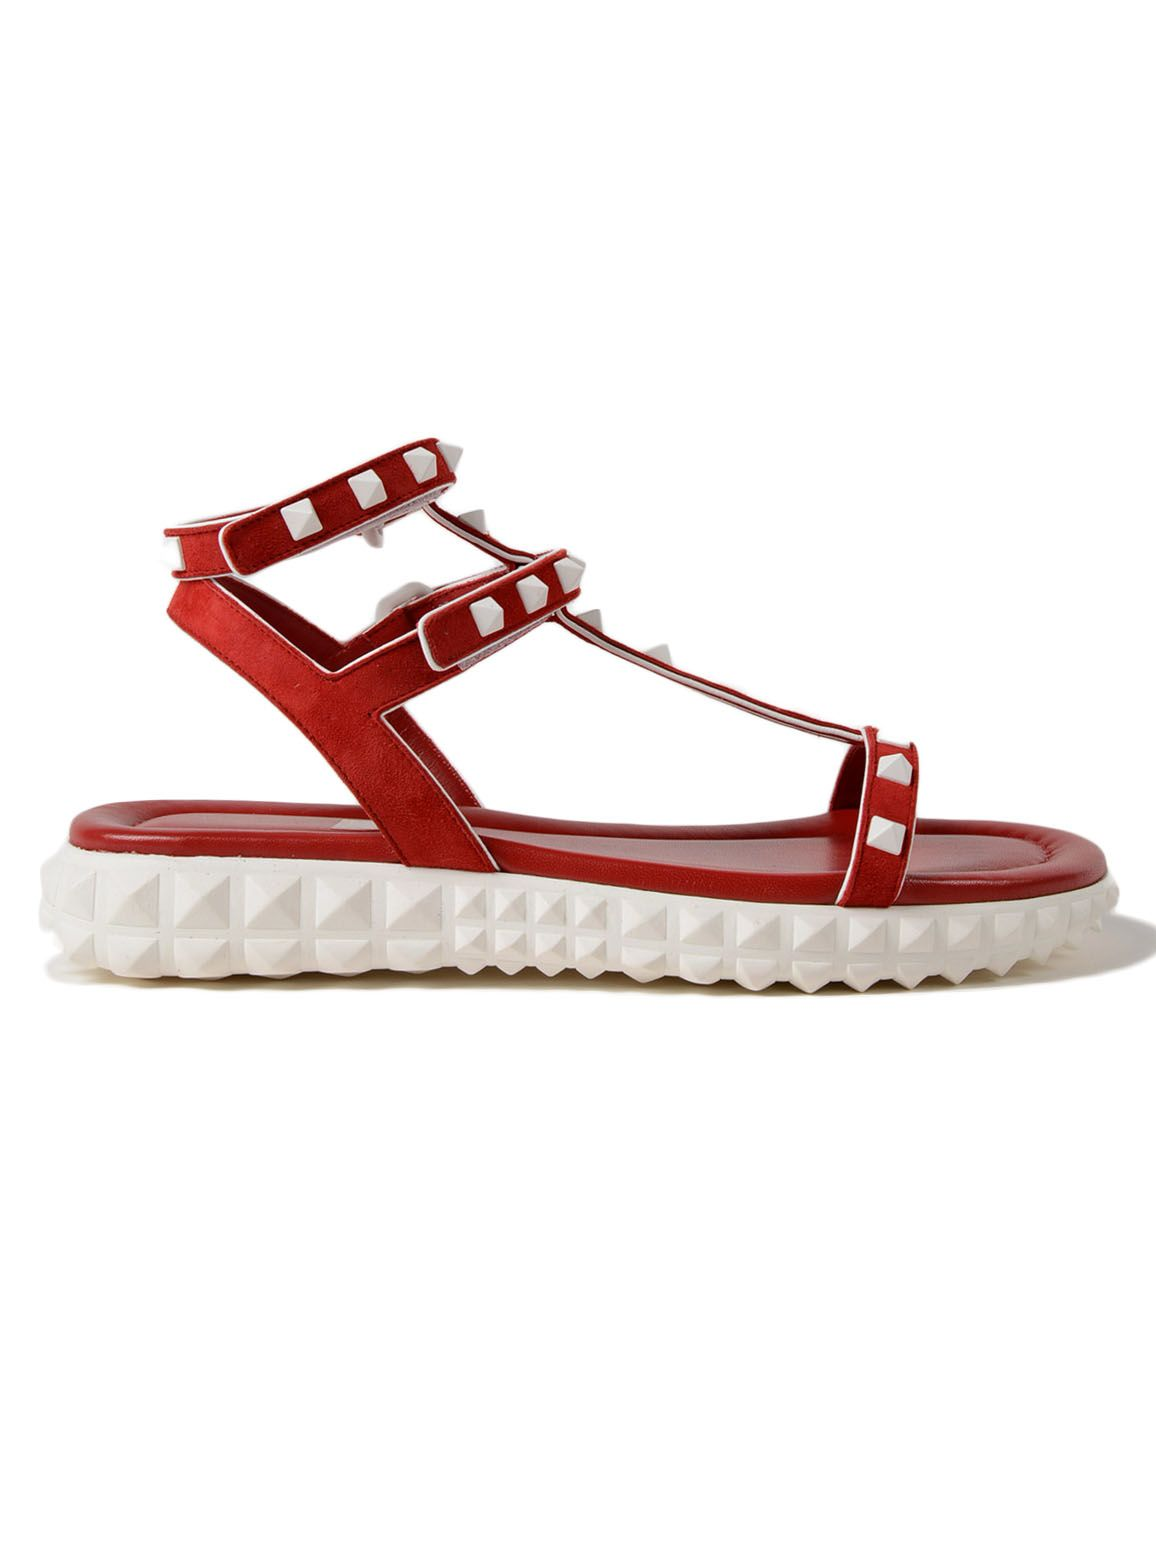 Valentino Garavani Flat Sandal Free Rockstud